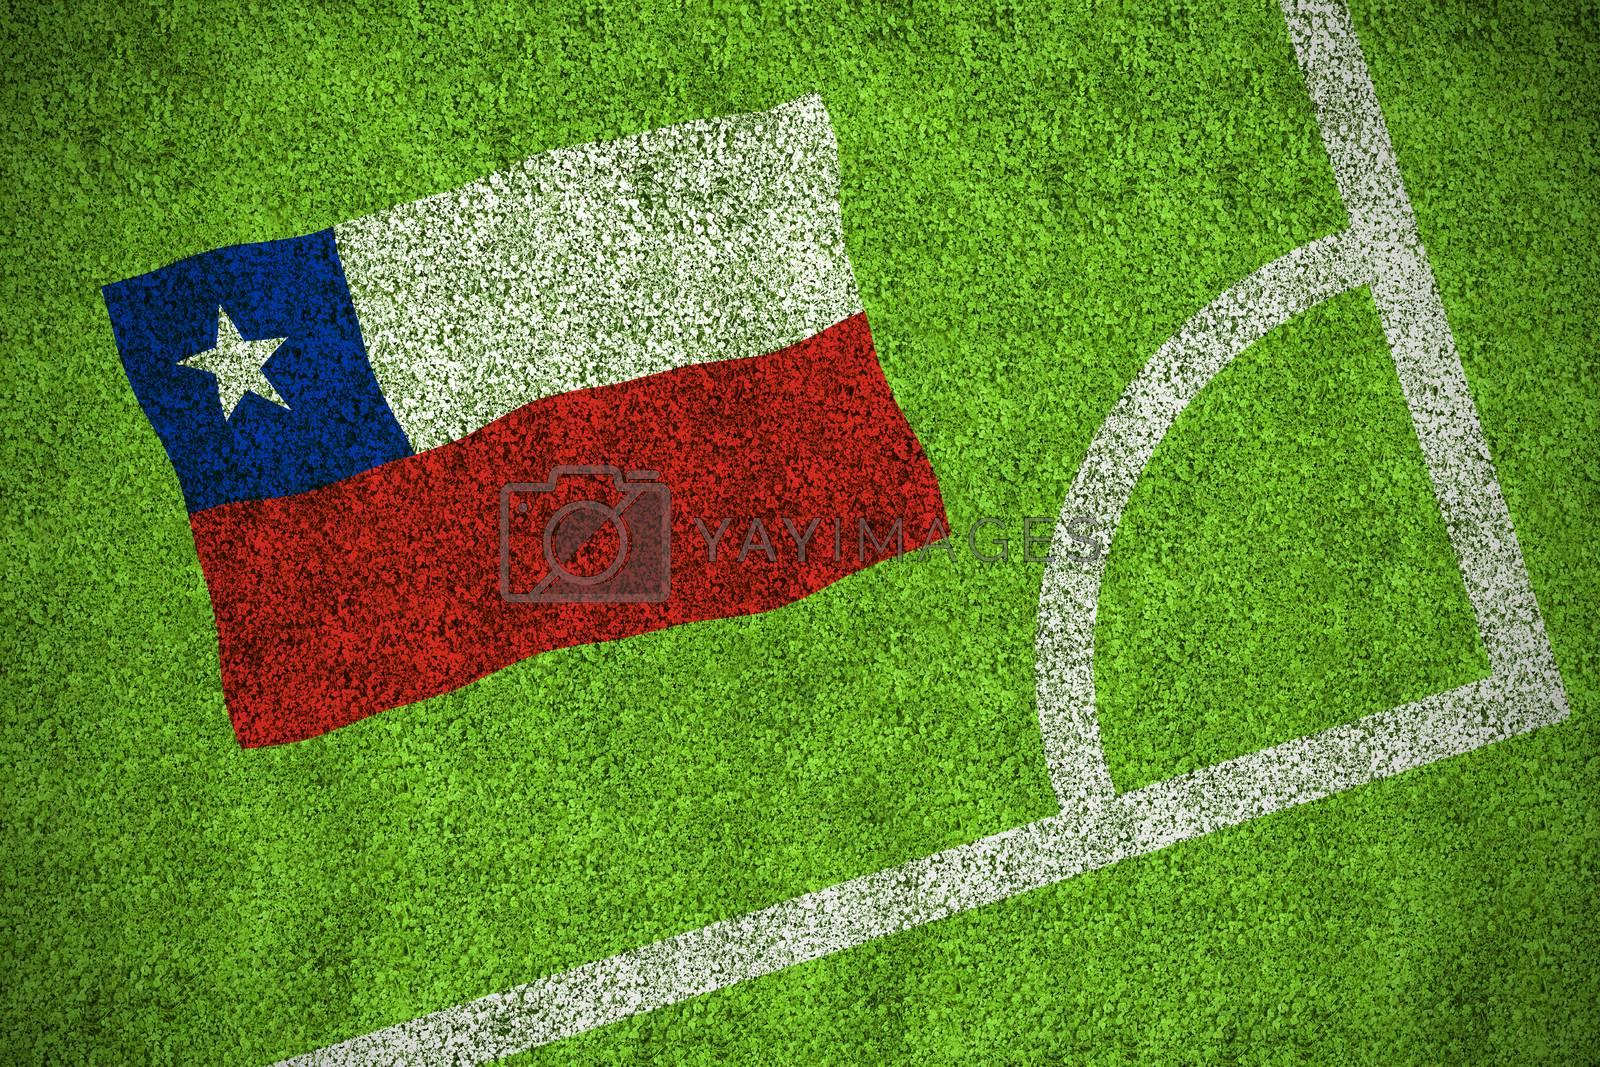 Chile national flag by Wavebreakmedia